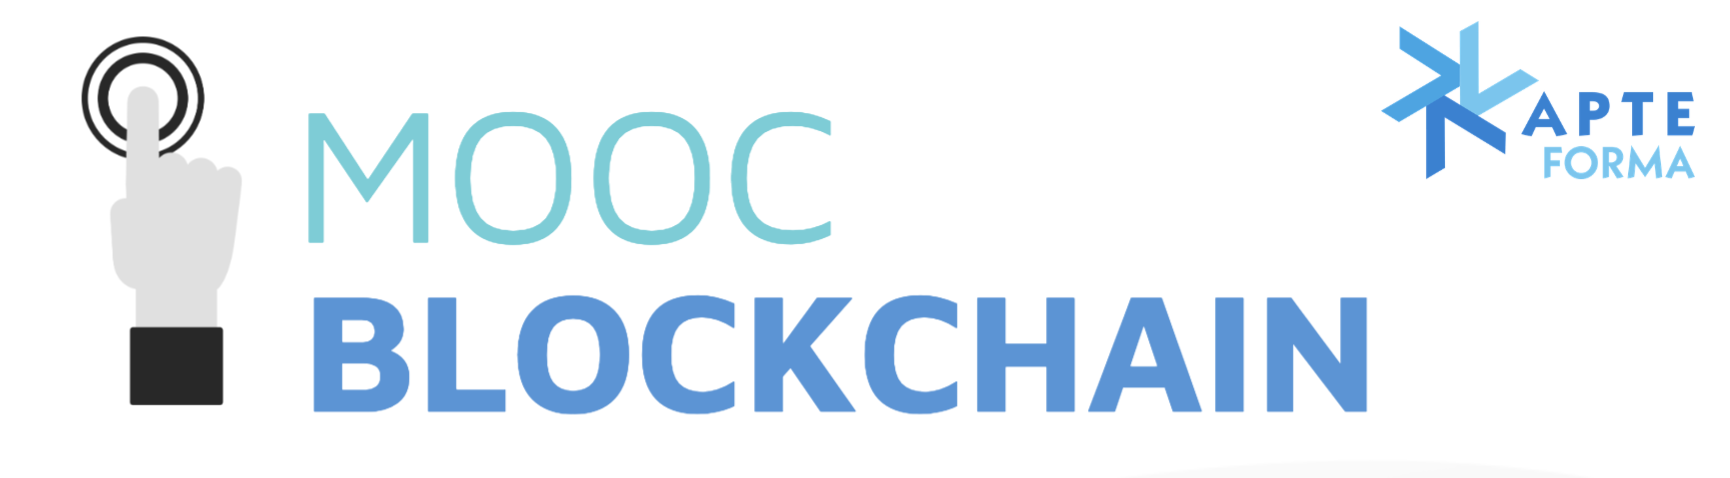 Infografía MOOC Blockchain